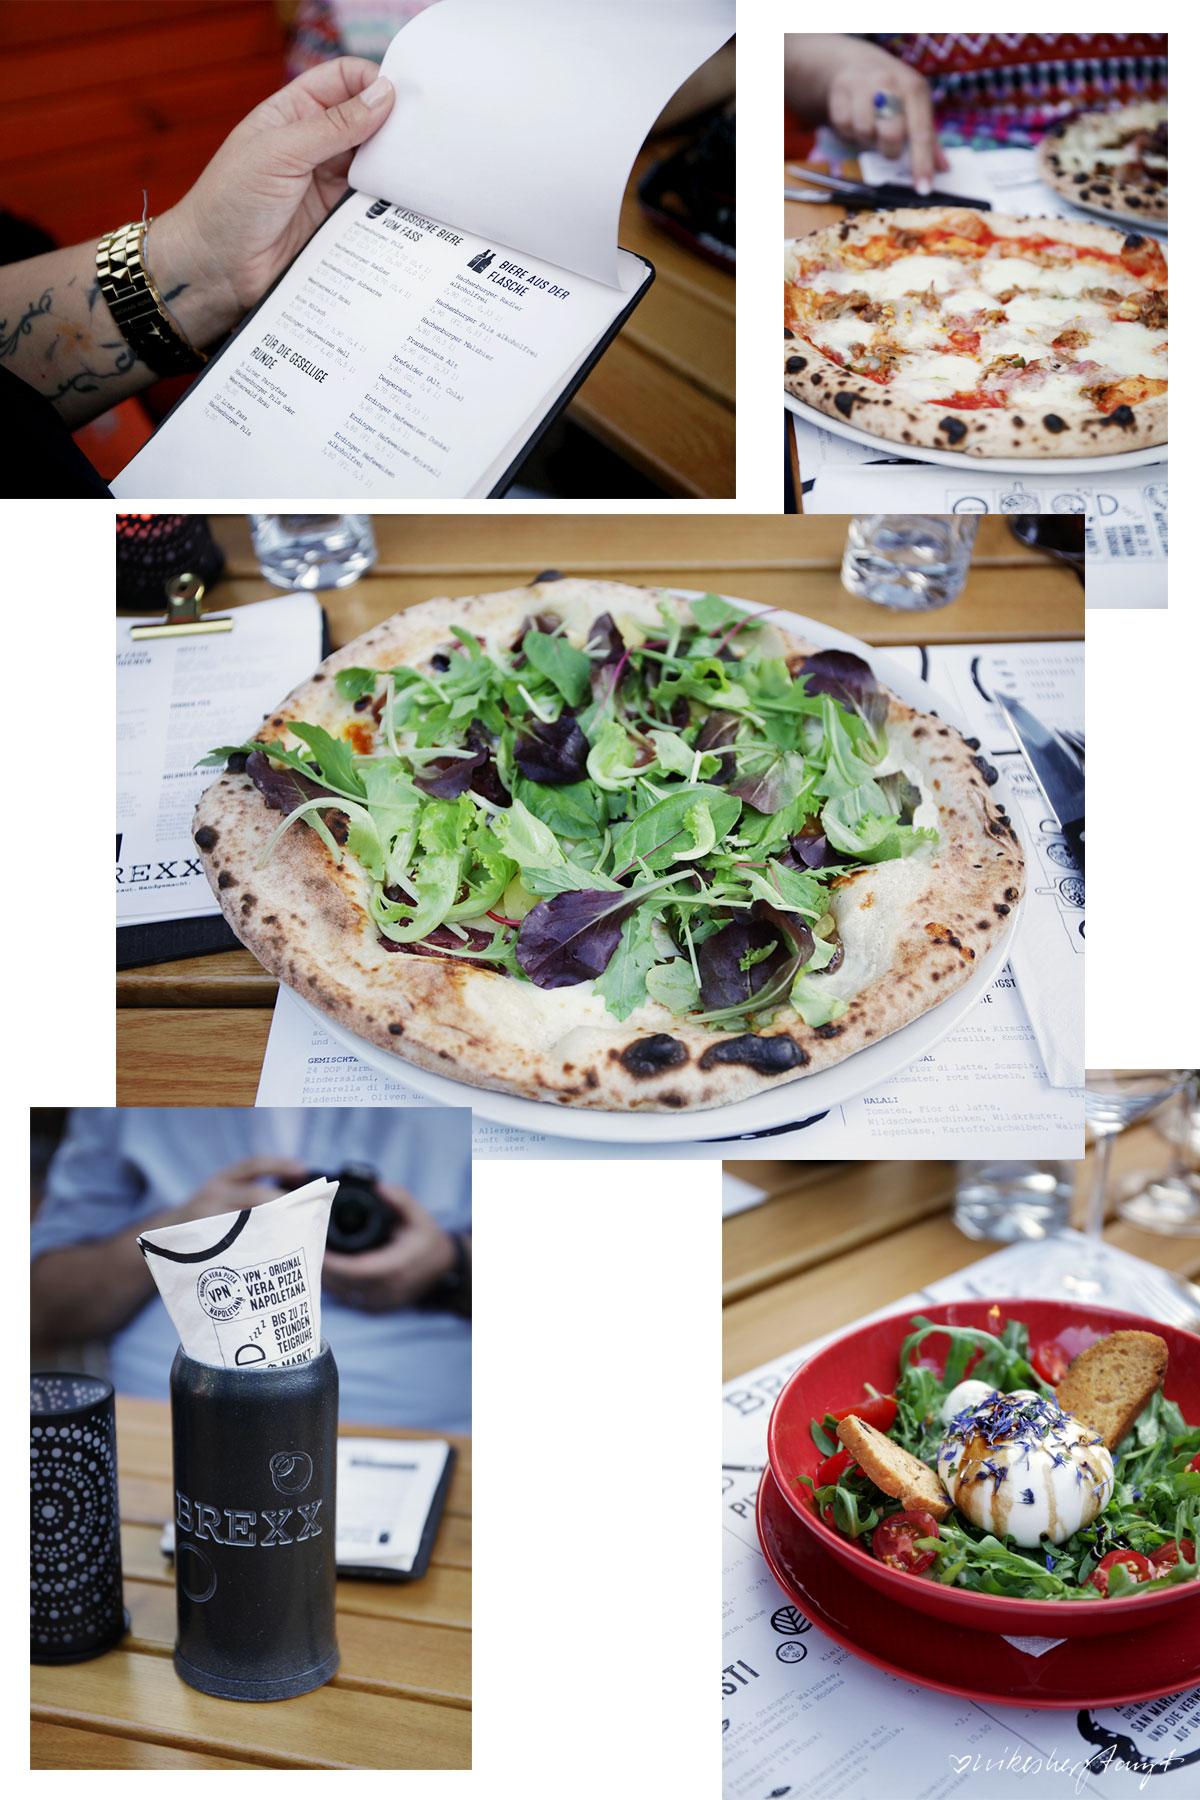 Brexx - Hausbrauerei, Pizzeria & Bowlingbahnen in Grenzau